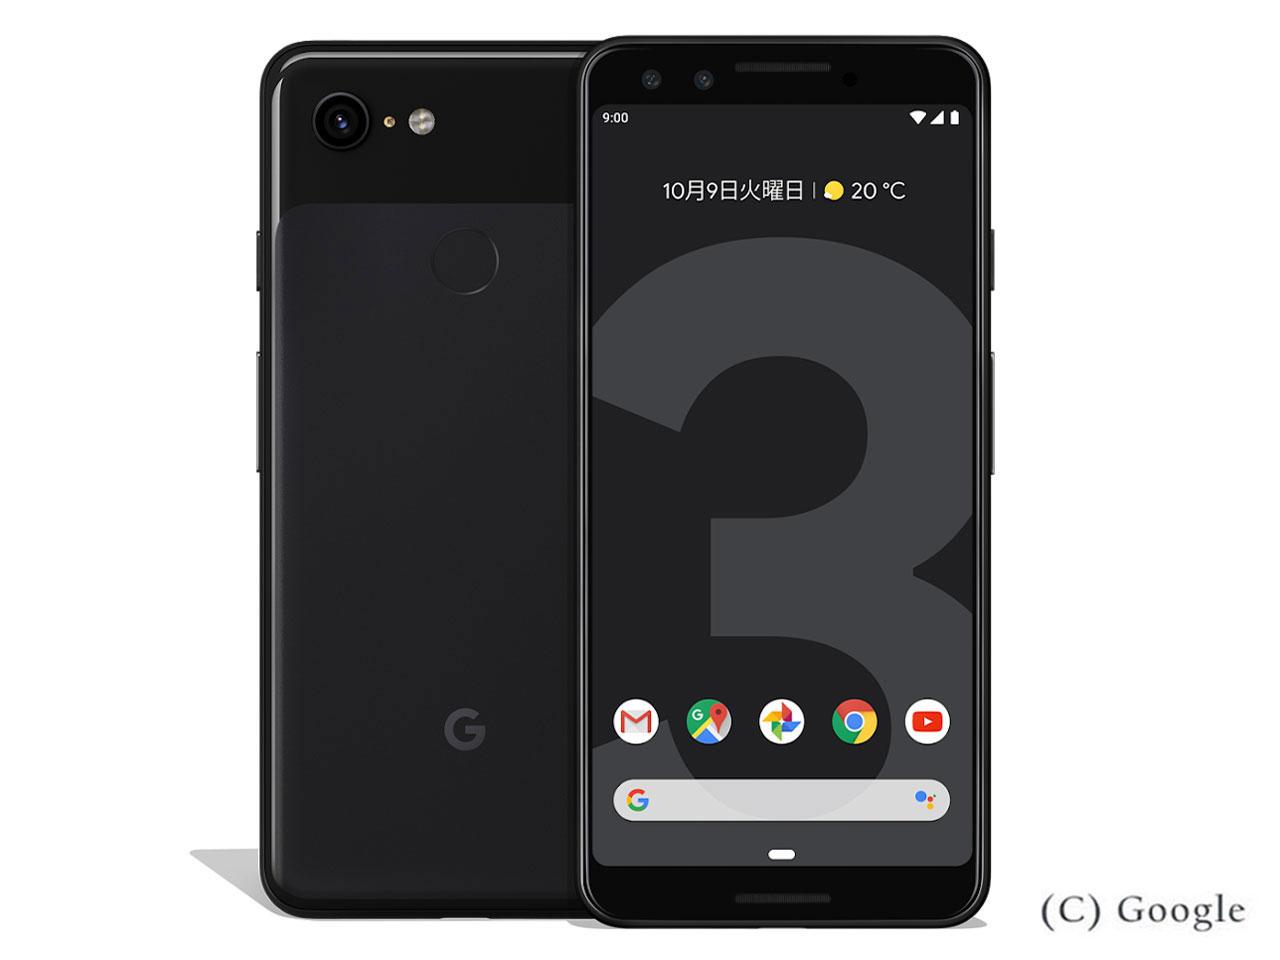 Google Pixel 3 64GB [ジャスト ブラック]  白ロム SIMロック解除済 docomo 2018年秋モデ JAN:842776107671